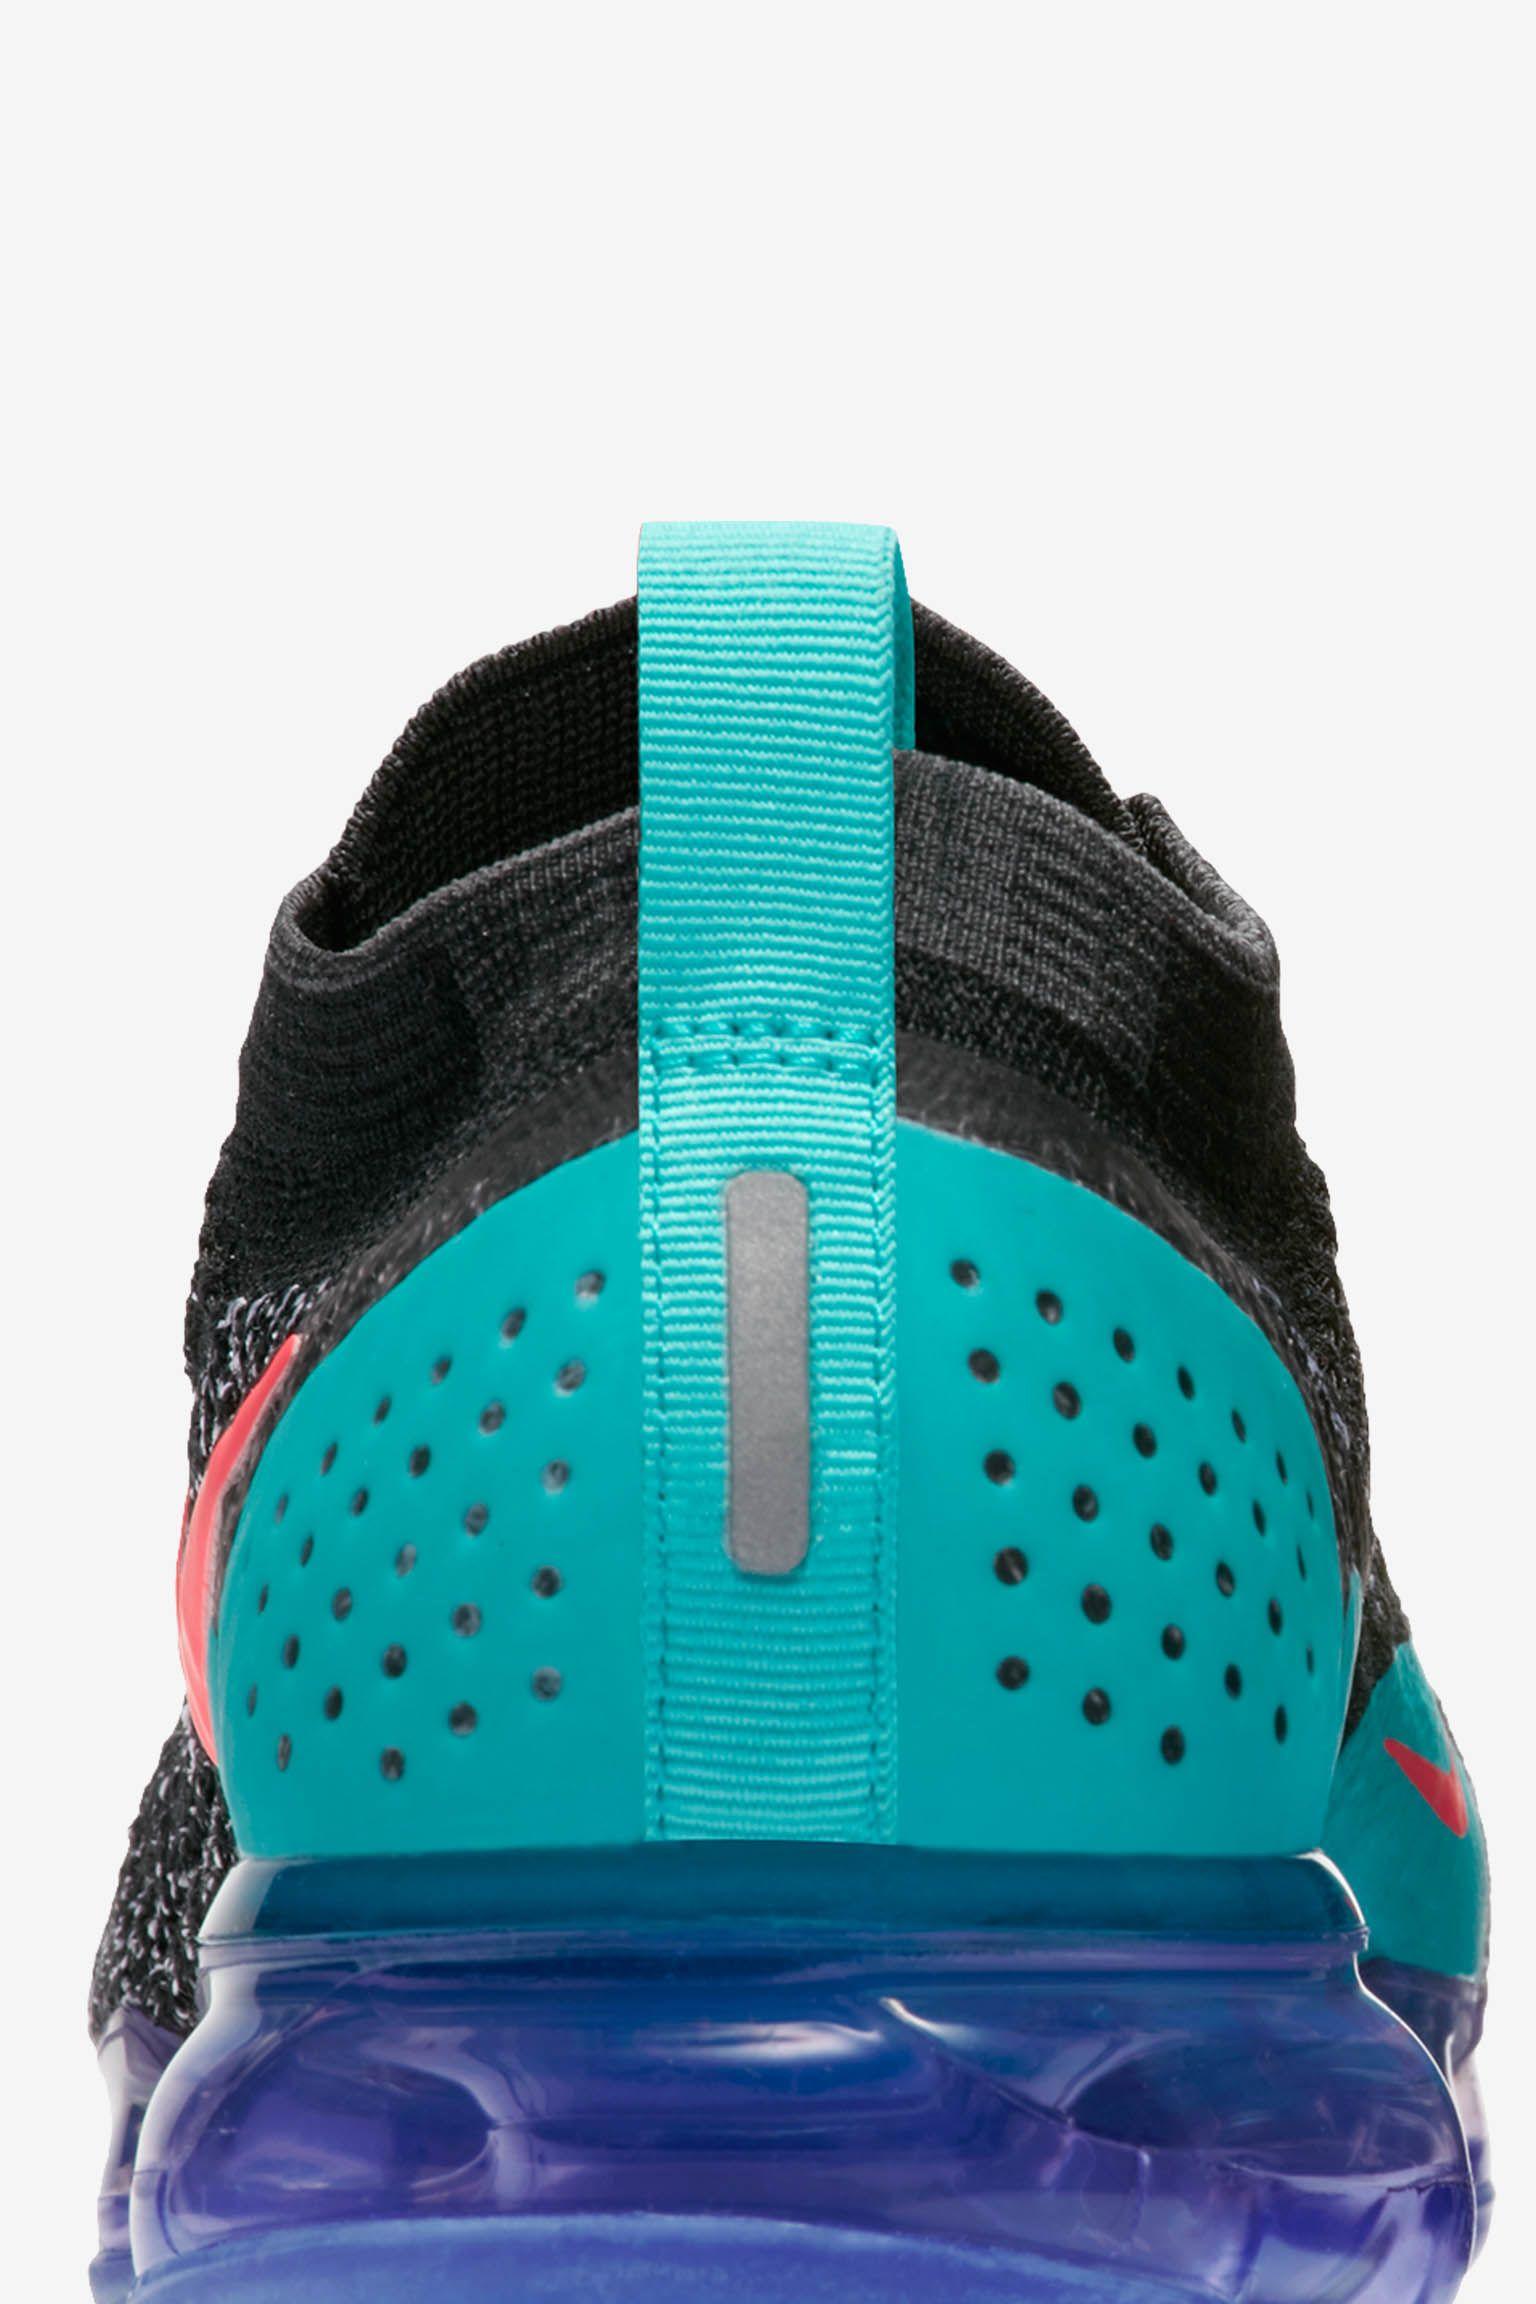 Nike Women's Air Vapormax Flyknit 2 'Black & Hot Punch' Release Date